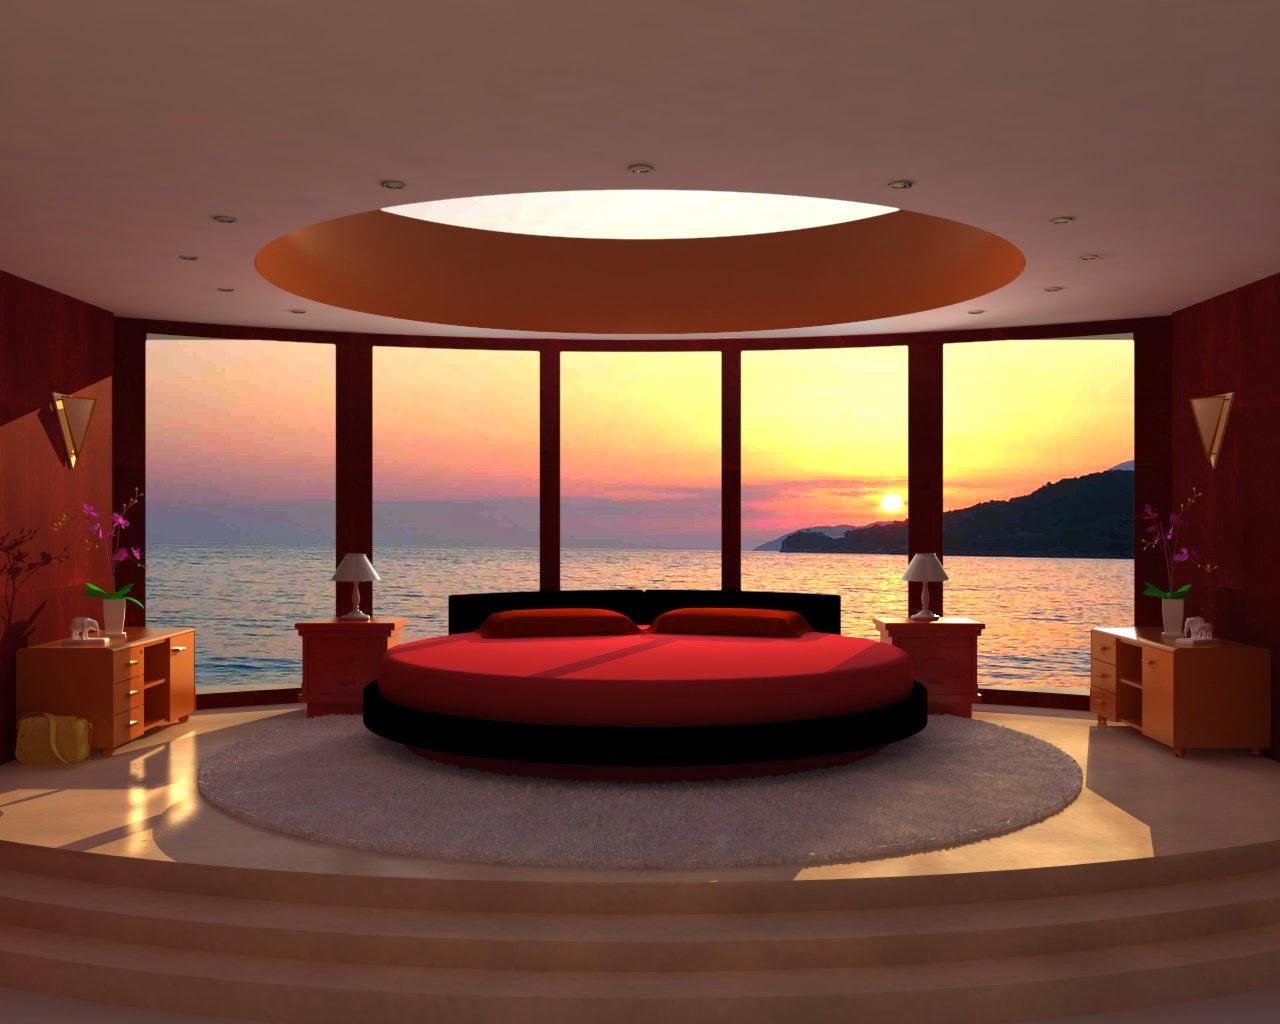 red and black bedroom decor ideas ~ calgary, edmonton, toronto